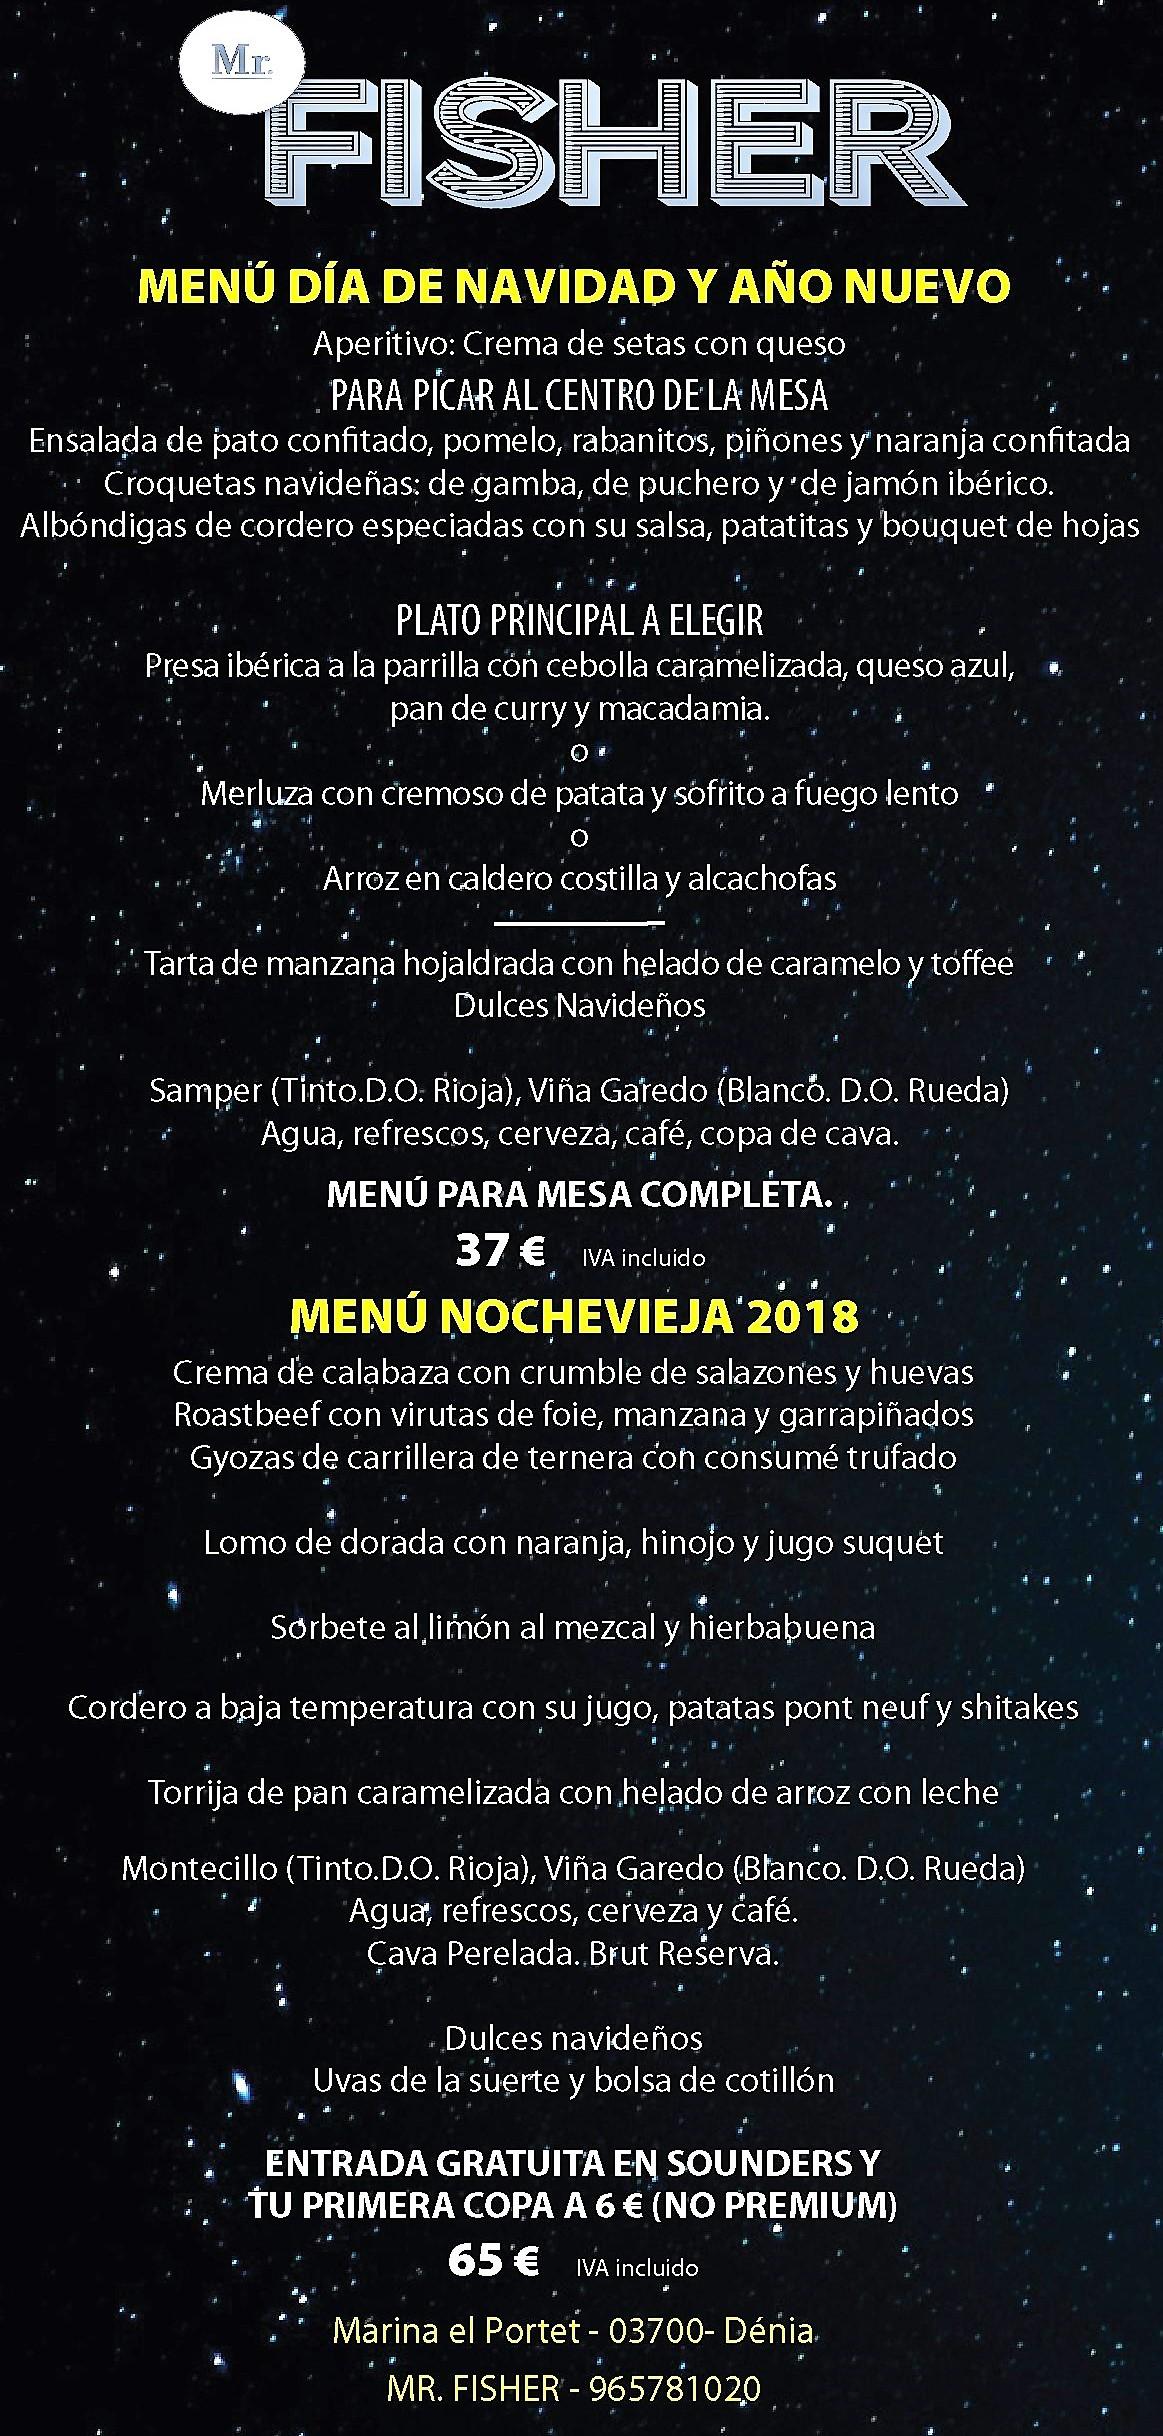 NAVIDAD NOCHEVIEJA FISHER 2018